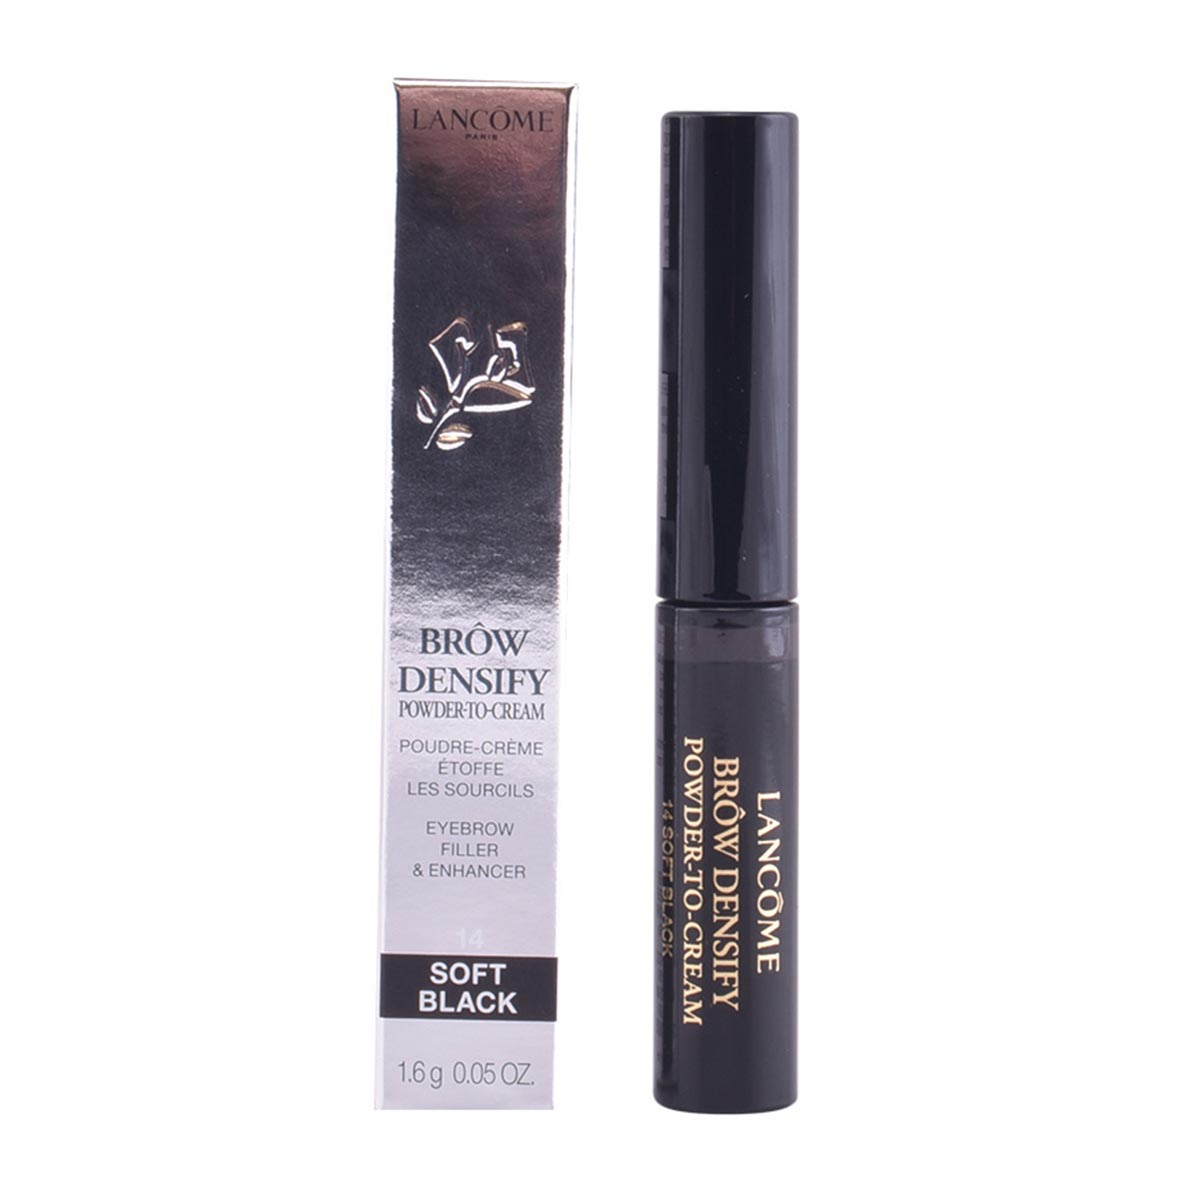 Lancome brow densify powder to cream 14 soft black